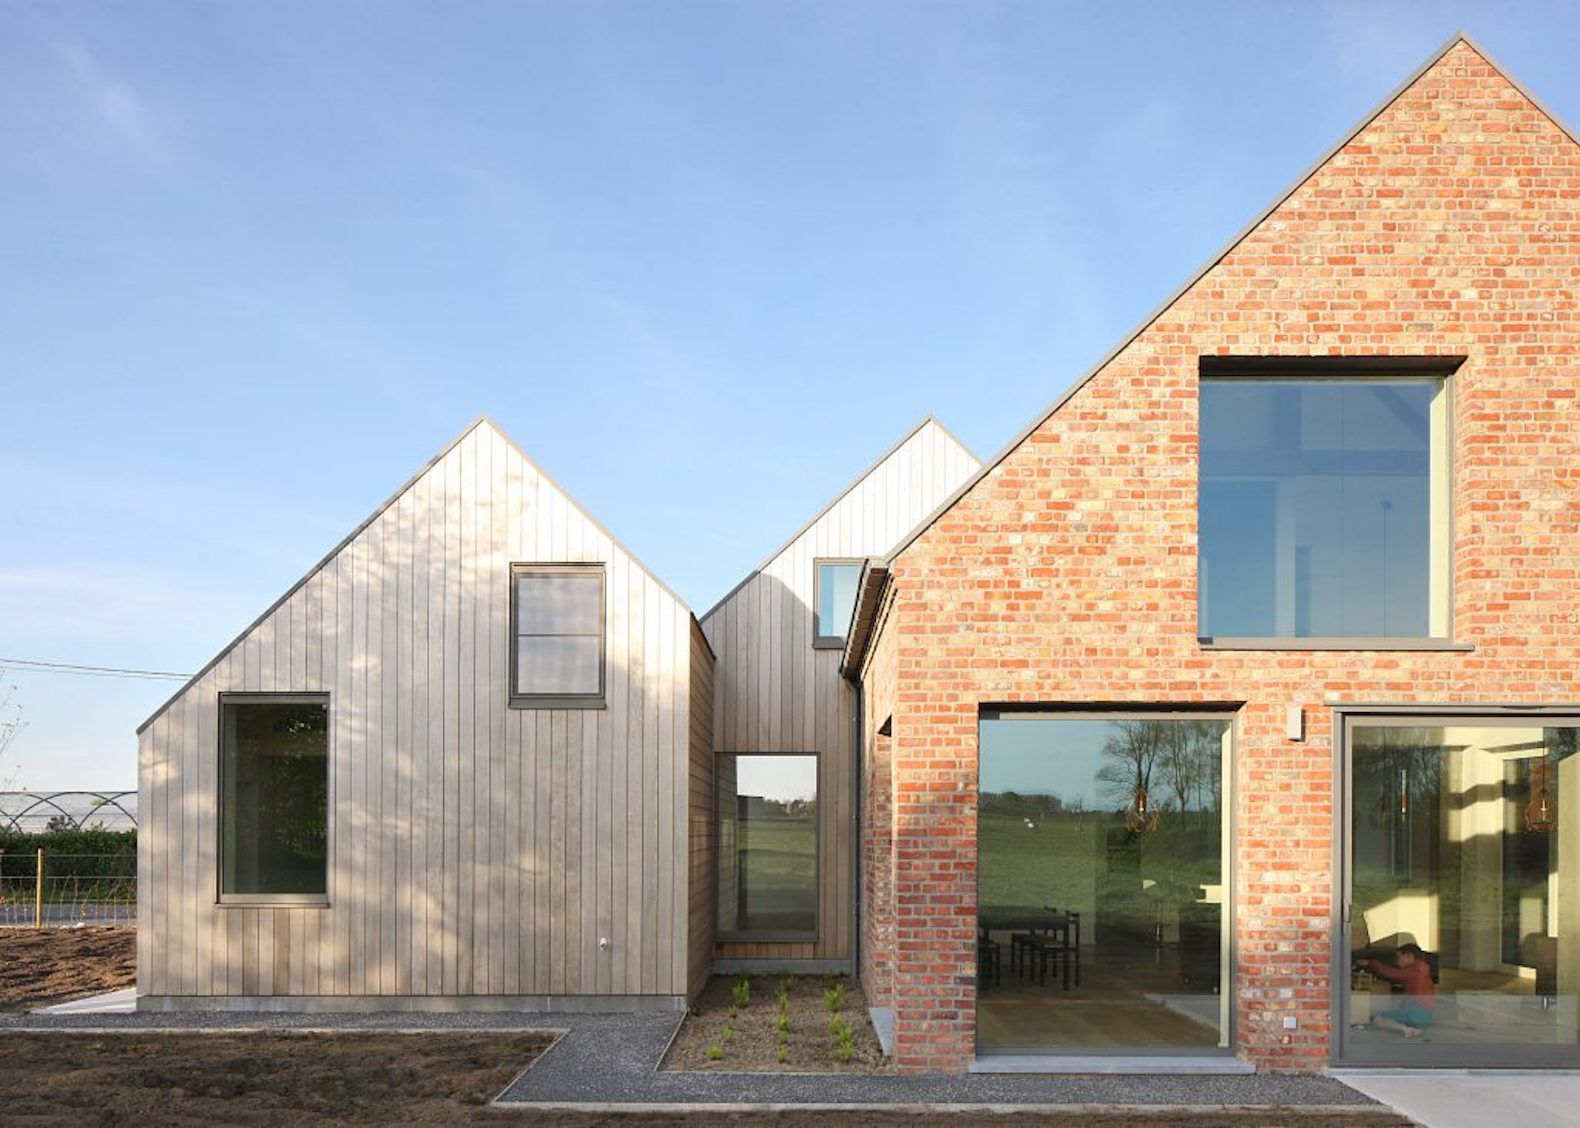 Historic Belgian Farmhouse Renovated Into A Modern Solar